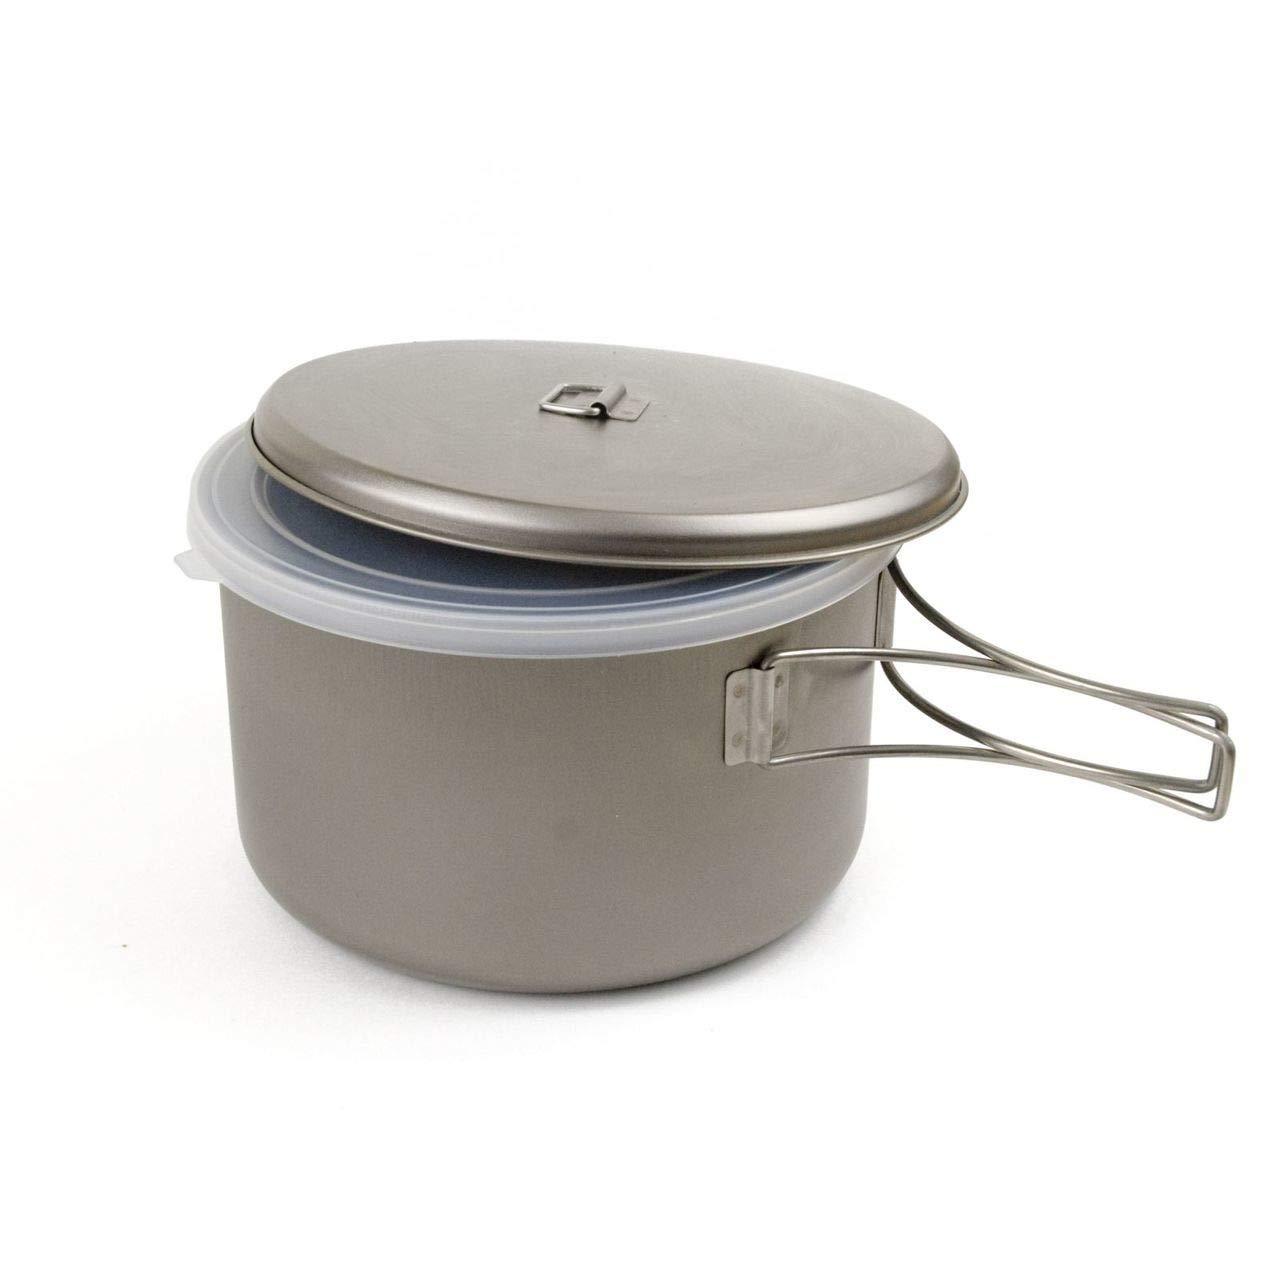 Snow Peak Titanium Cook N Save Cookware by Snow Peak